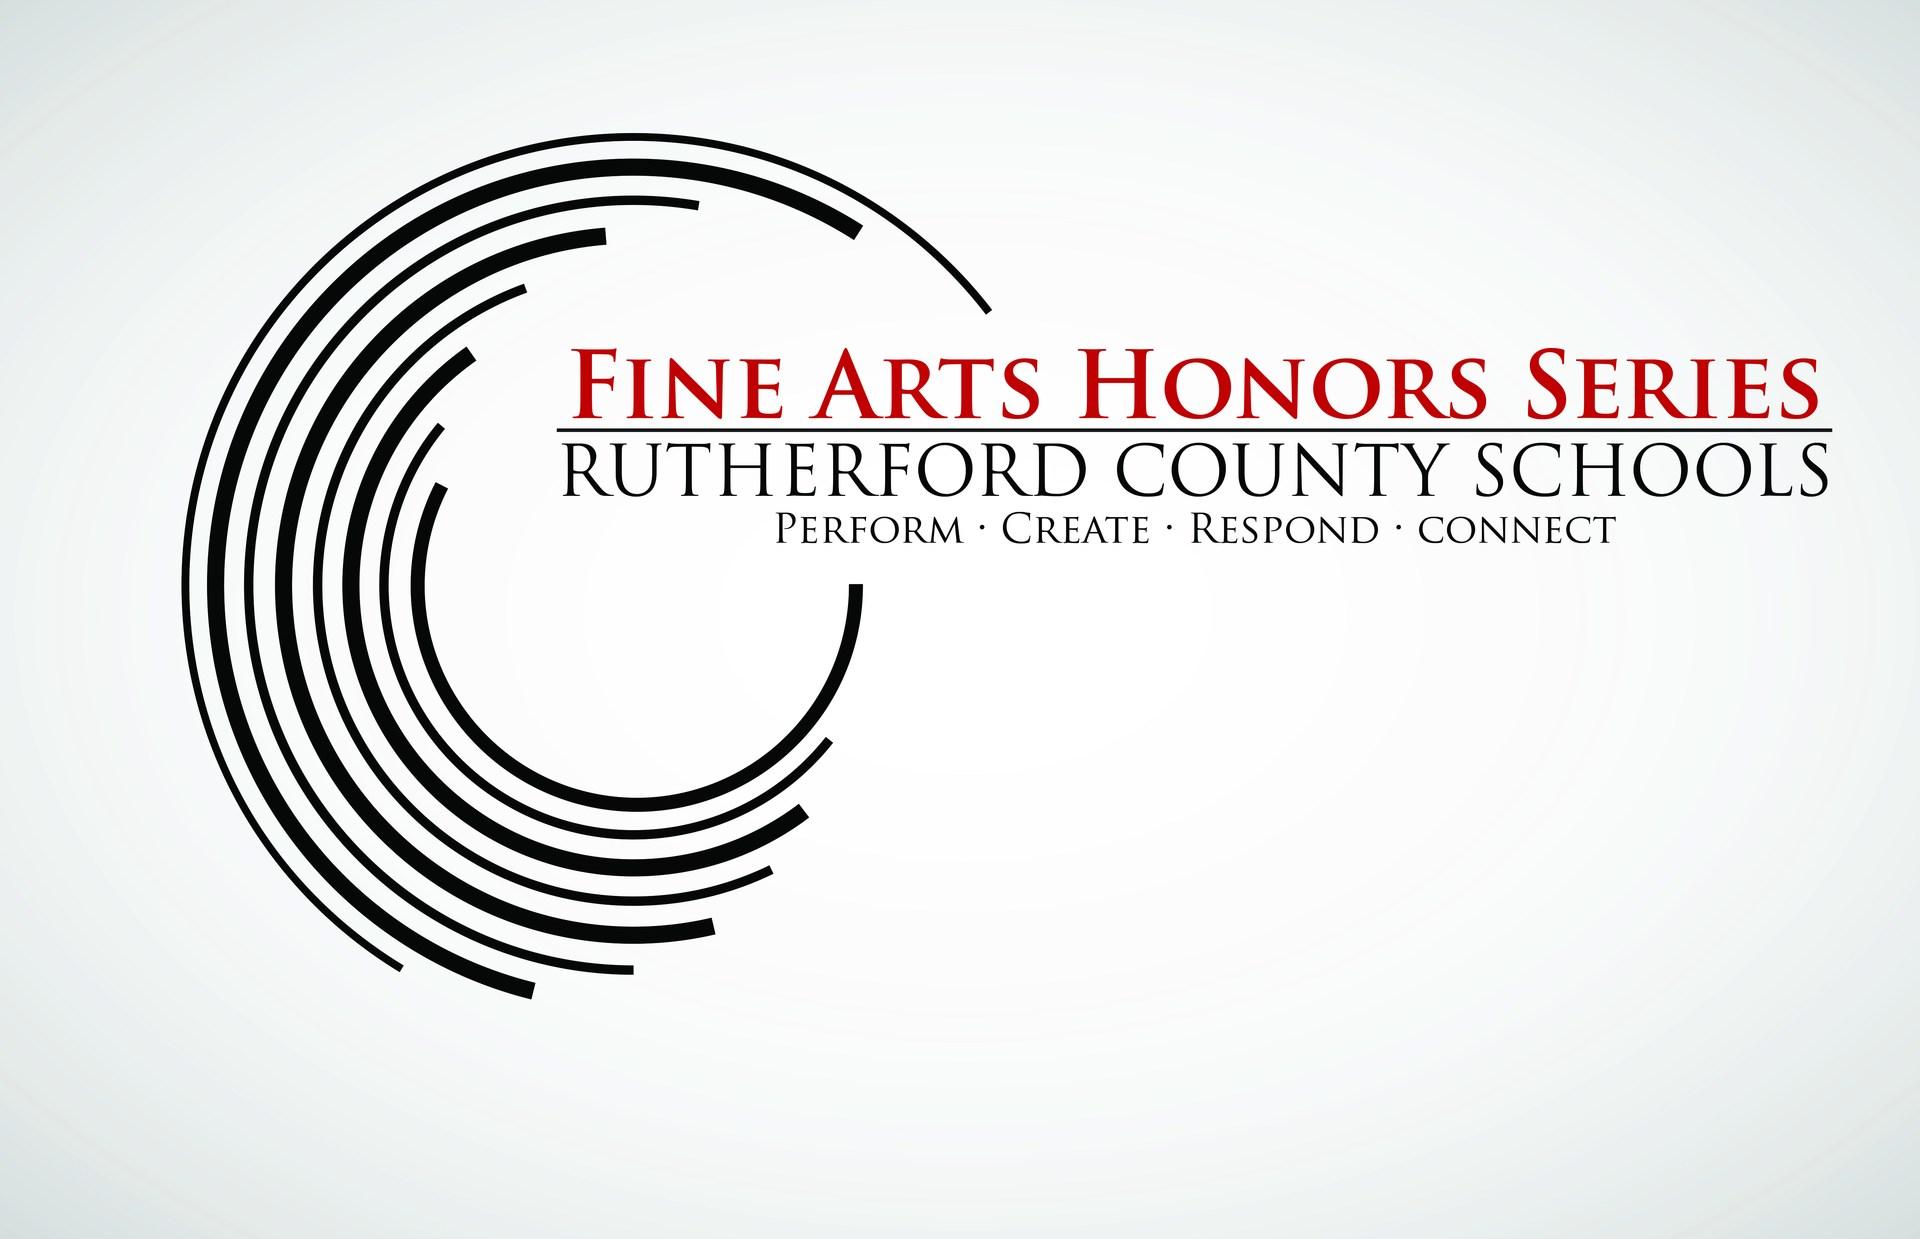 Fine Arts Honors Series Logo